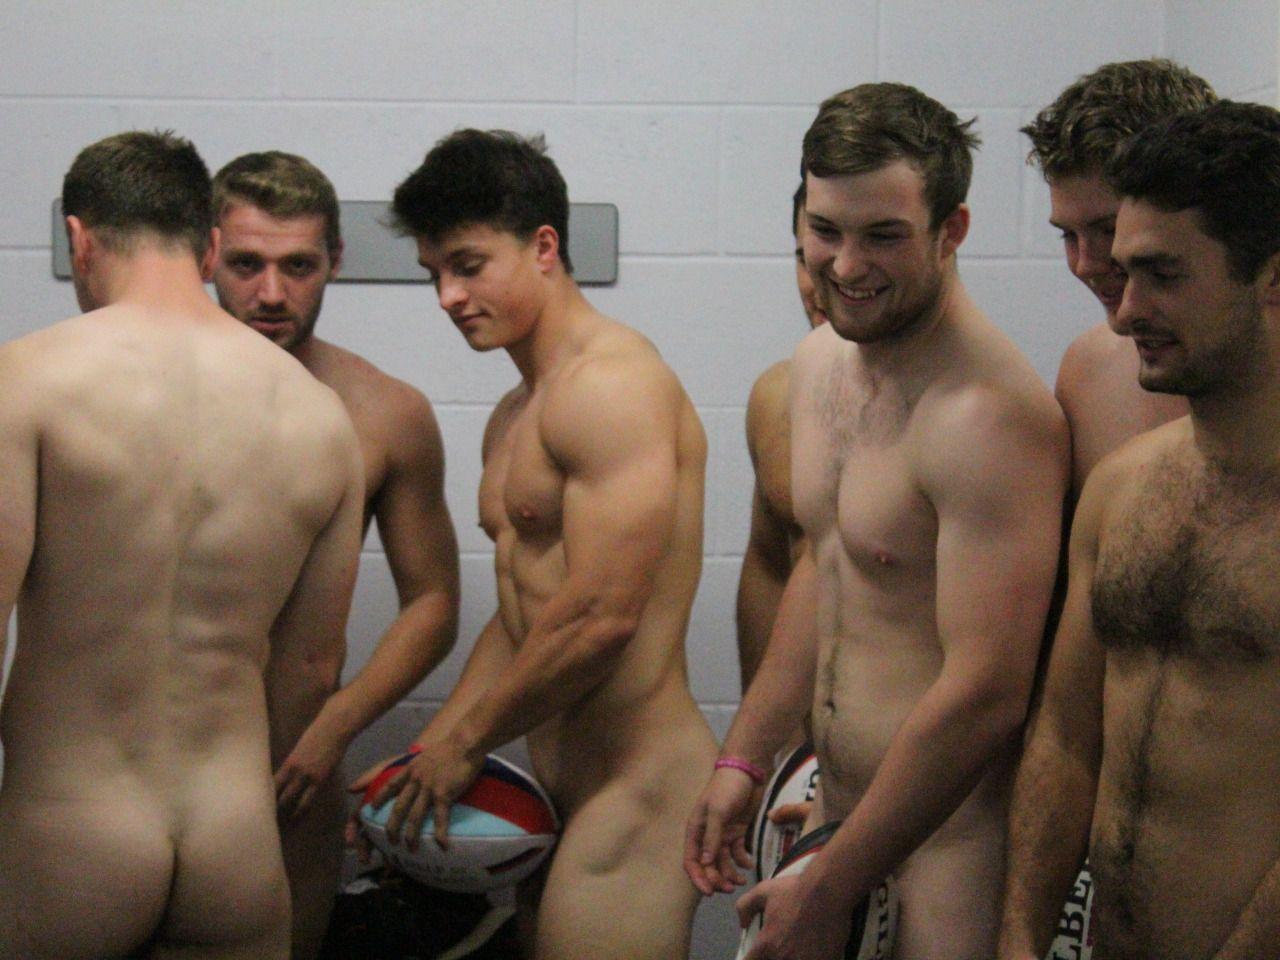 baseball-boys-locker-room-naked-naked-sexy-girls-smoking-weed